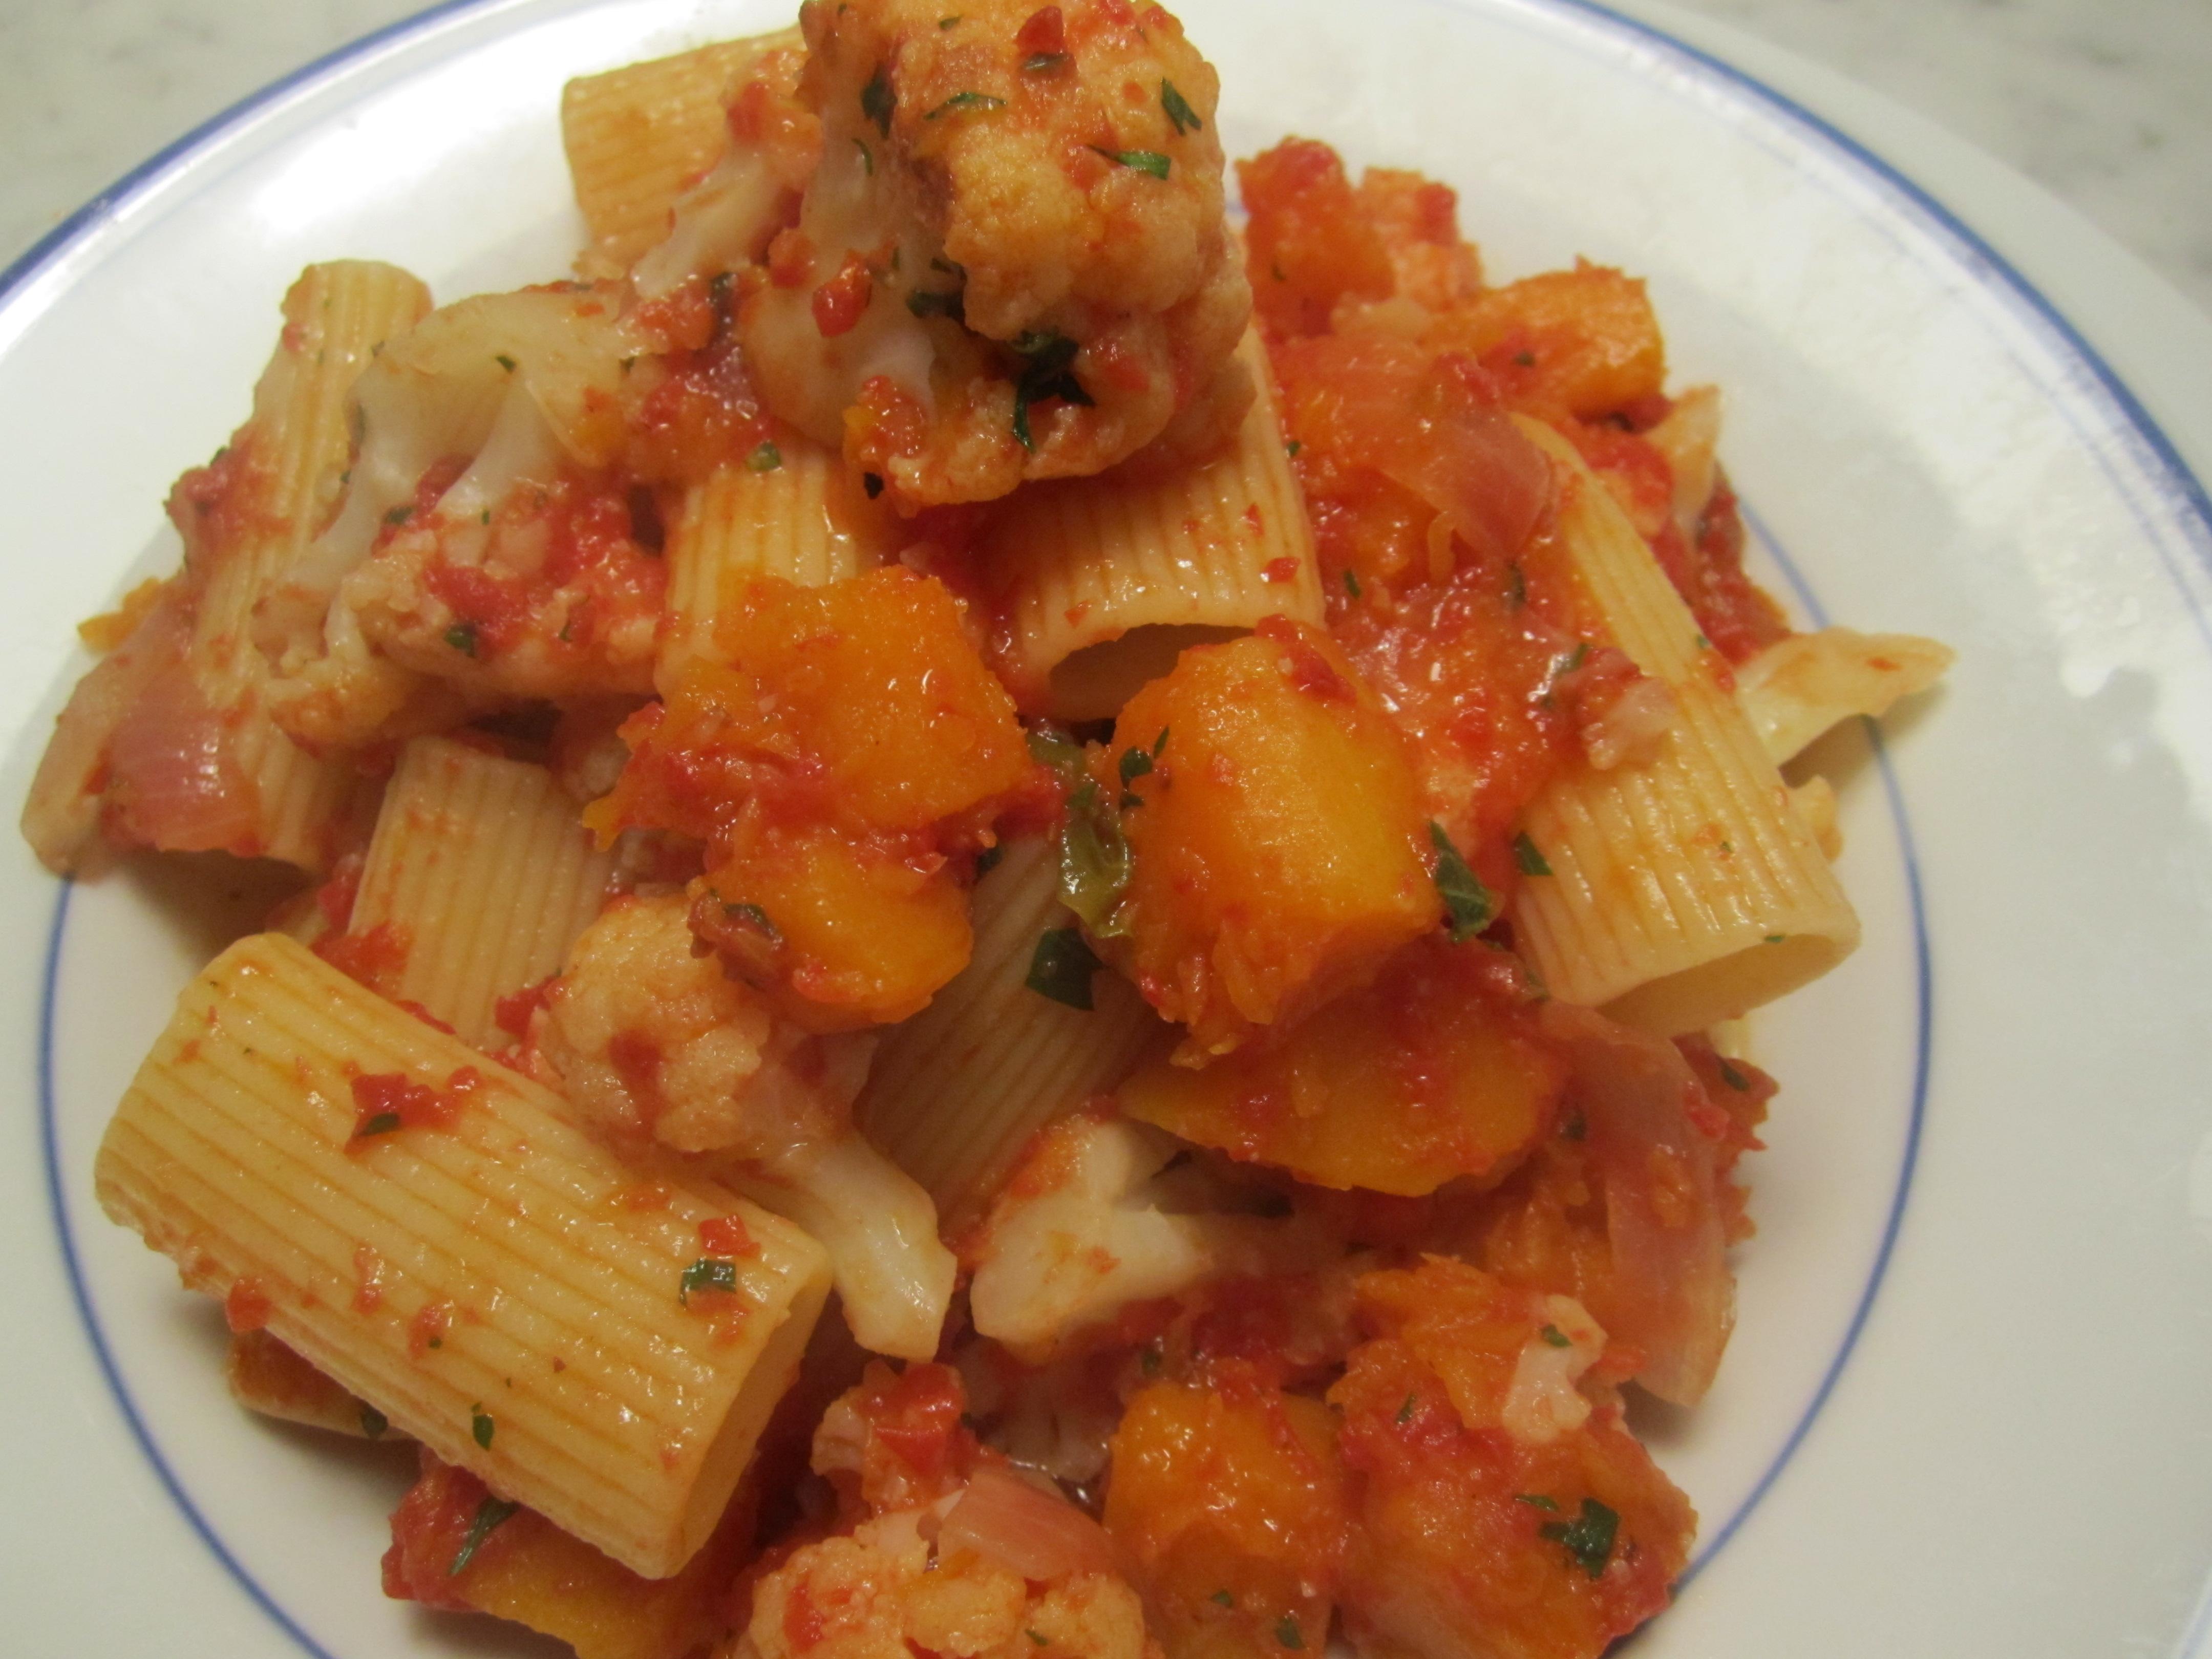 Cauliflower And Tofu Lasagna With Butternut Squash Sauce Recipes ...